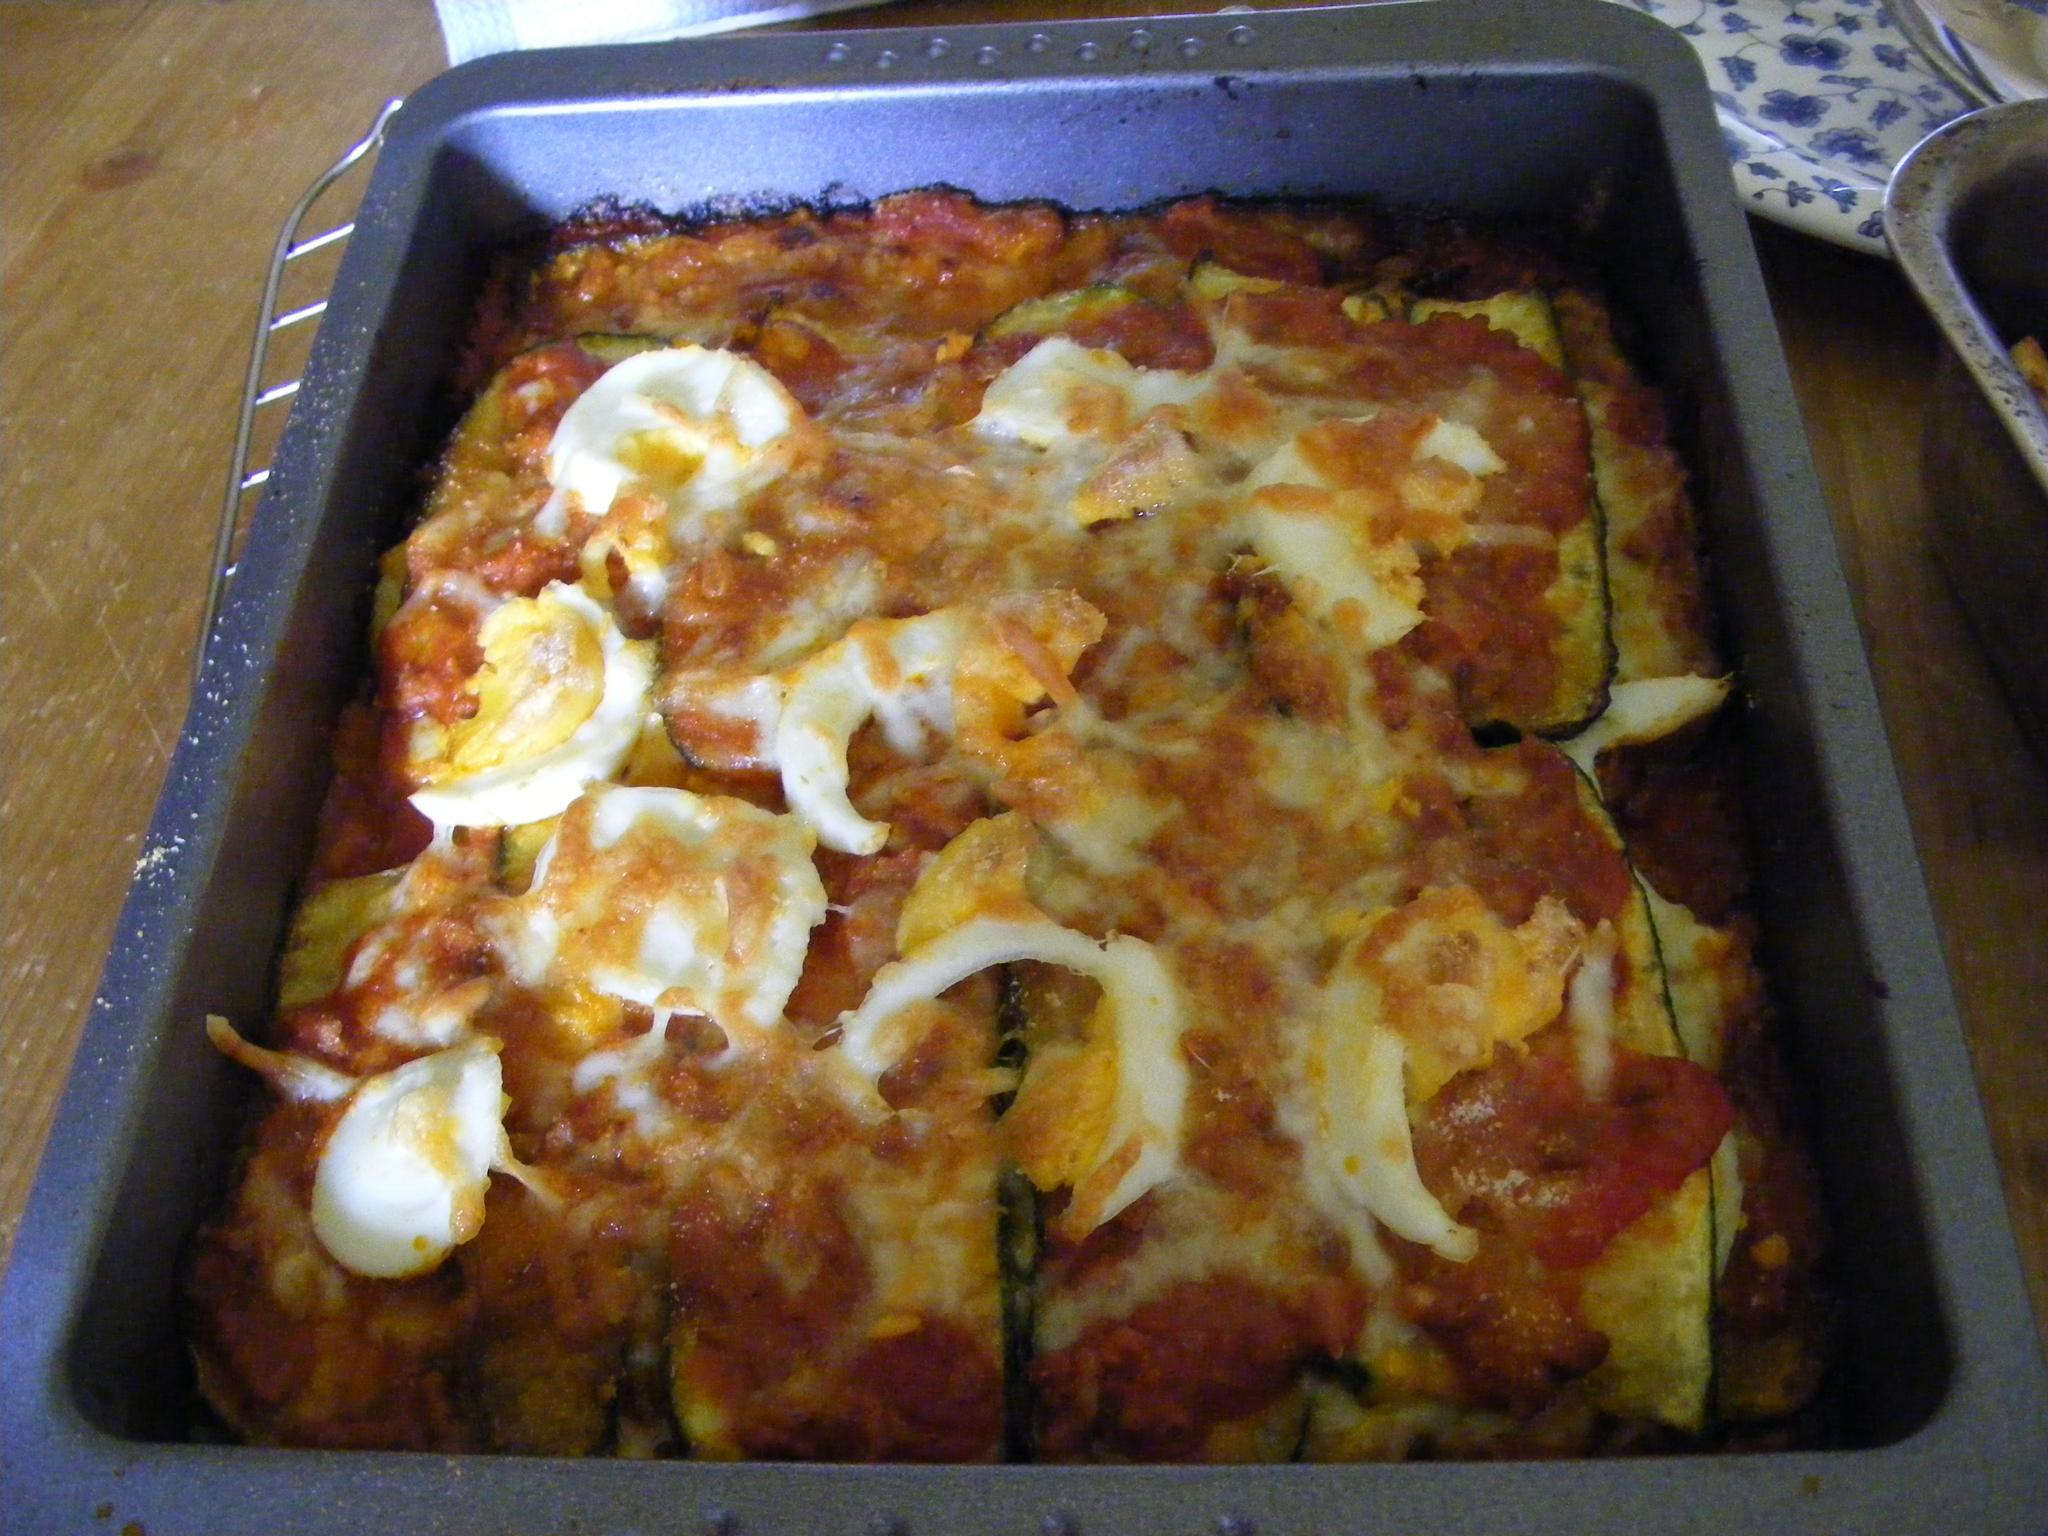 Zucchini. by swernthaler